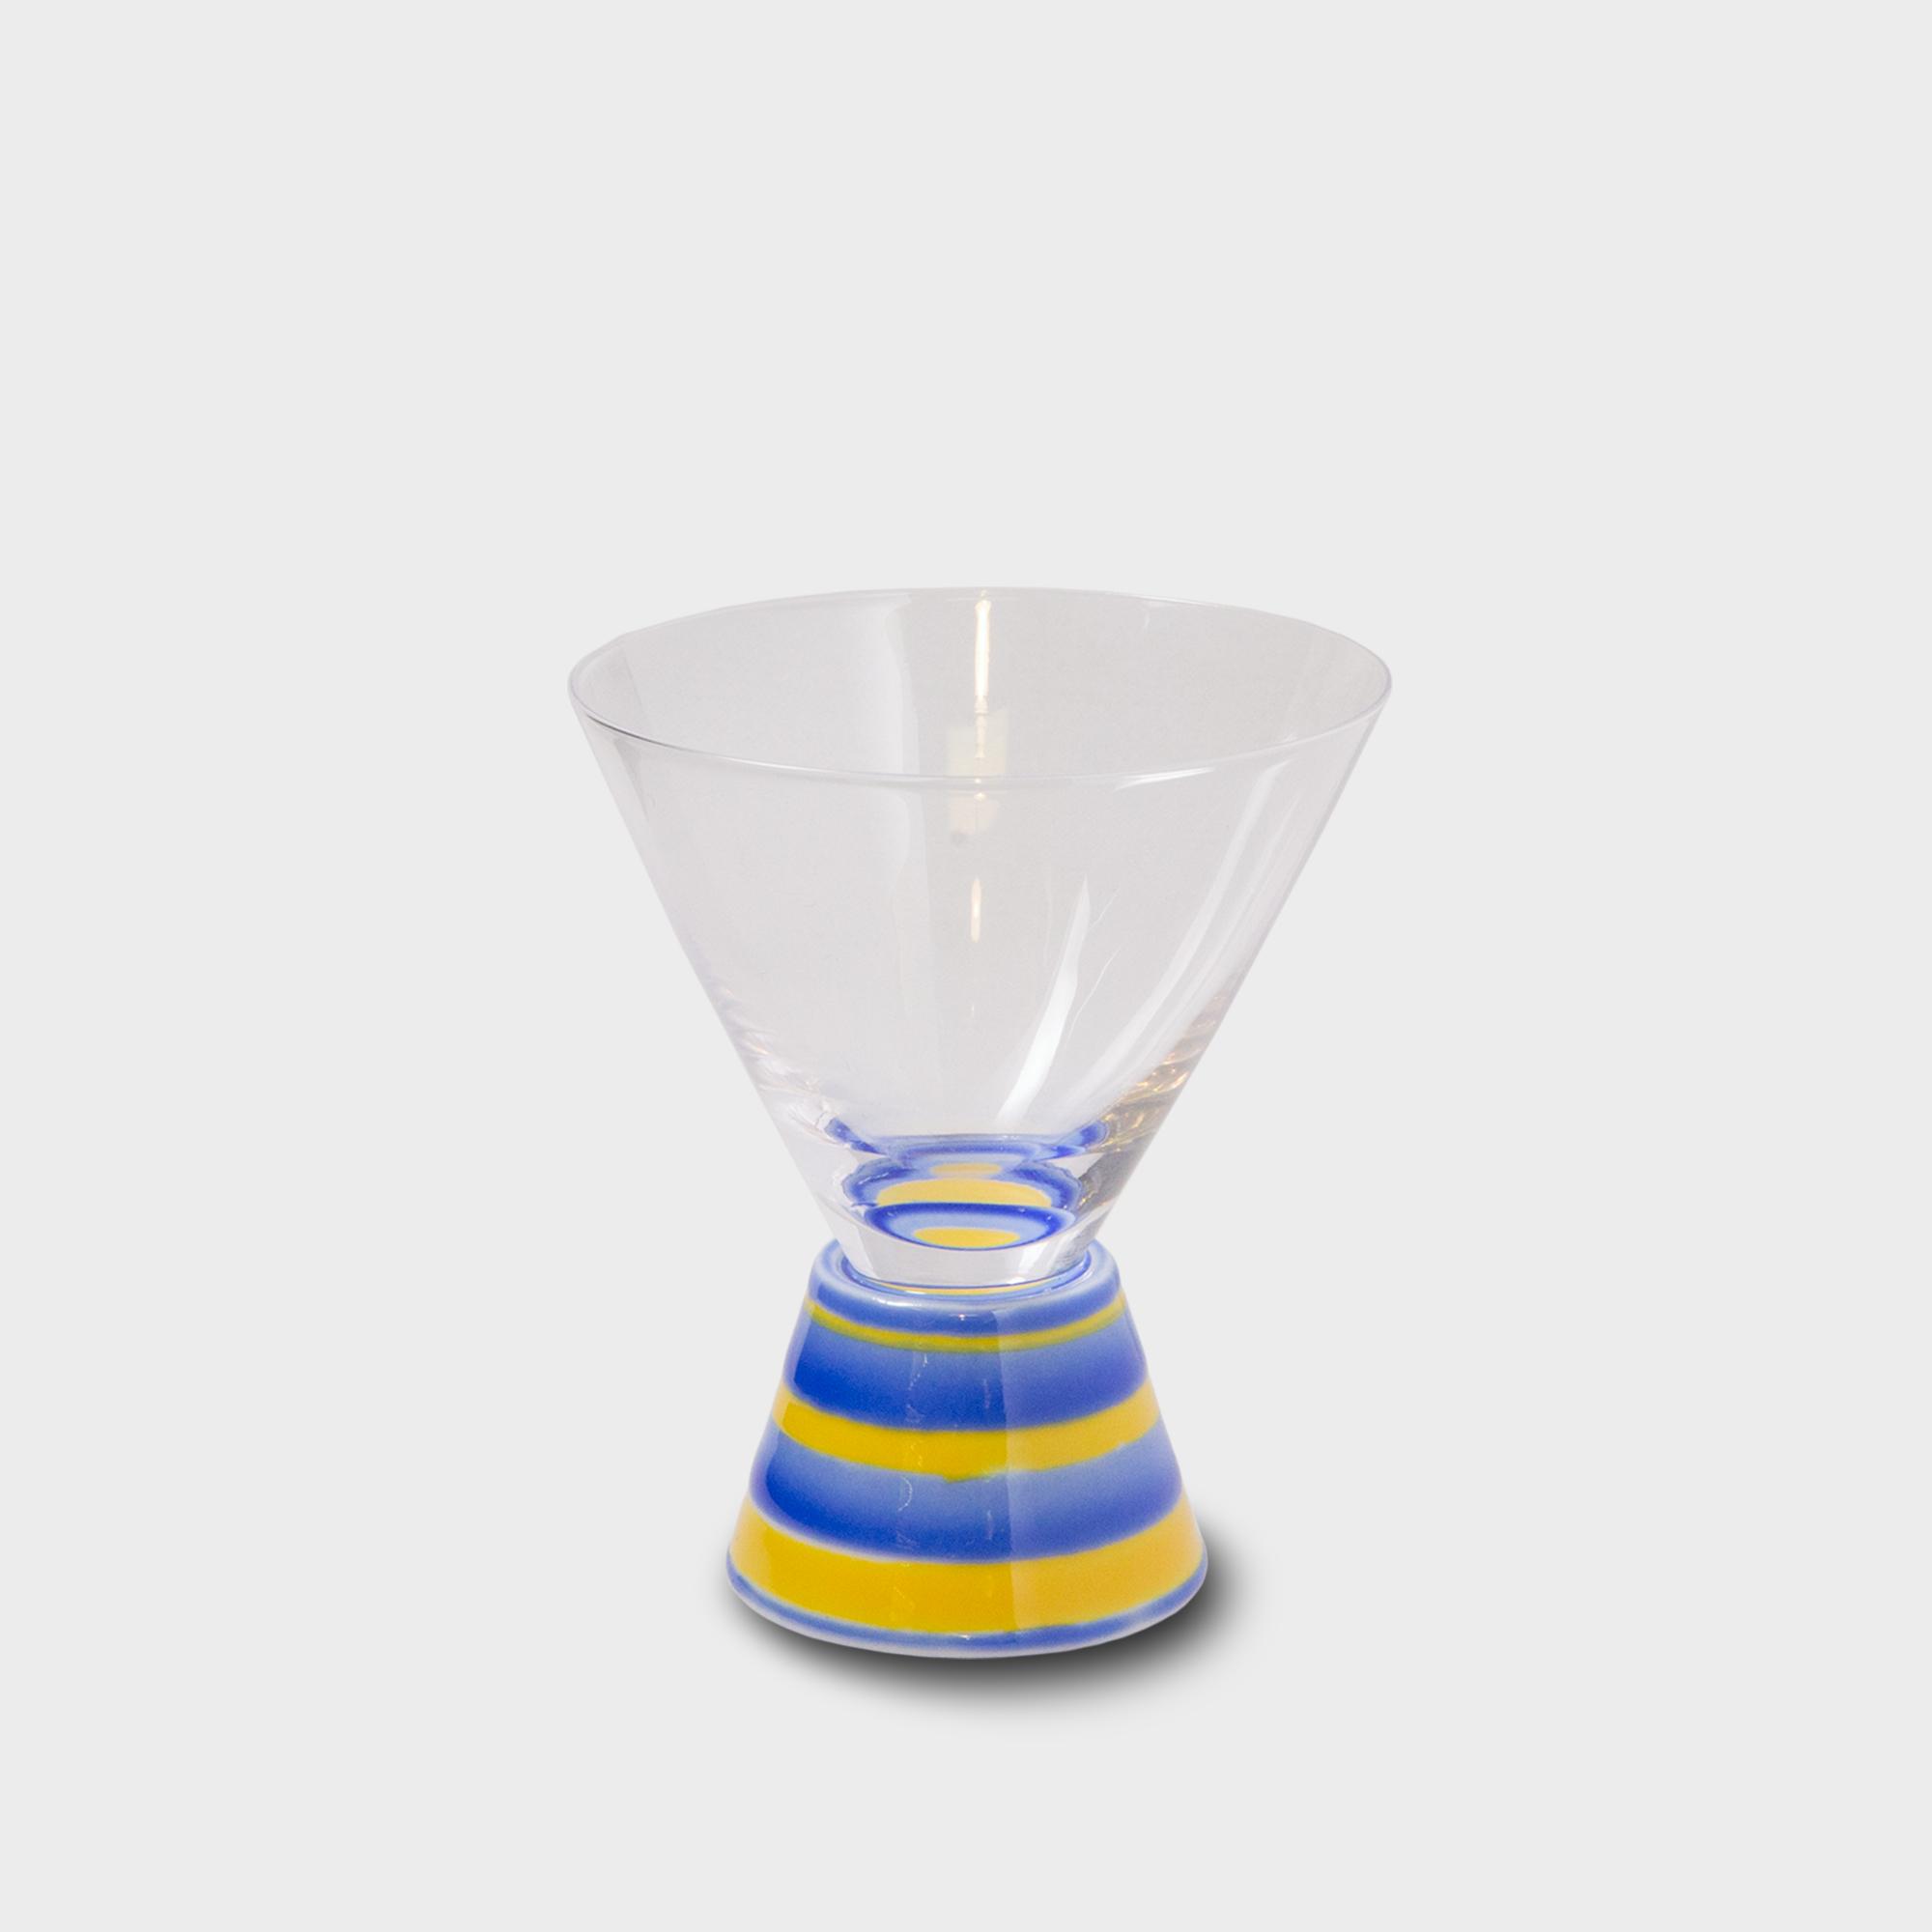 有田焼浪漫グラス SAKE GLASS丸形 黄交趾駒筋